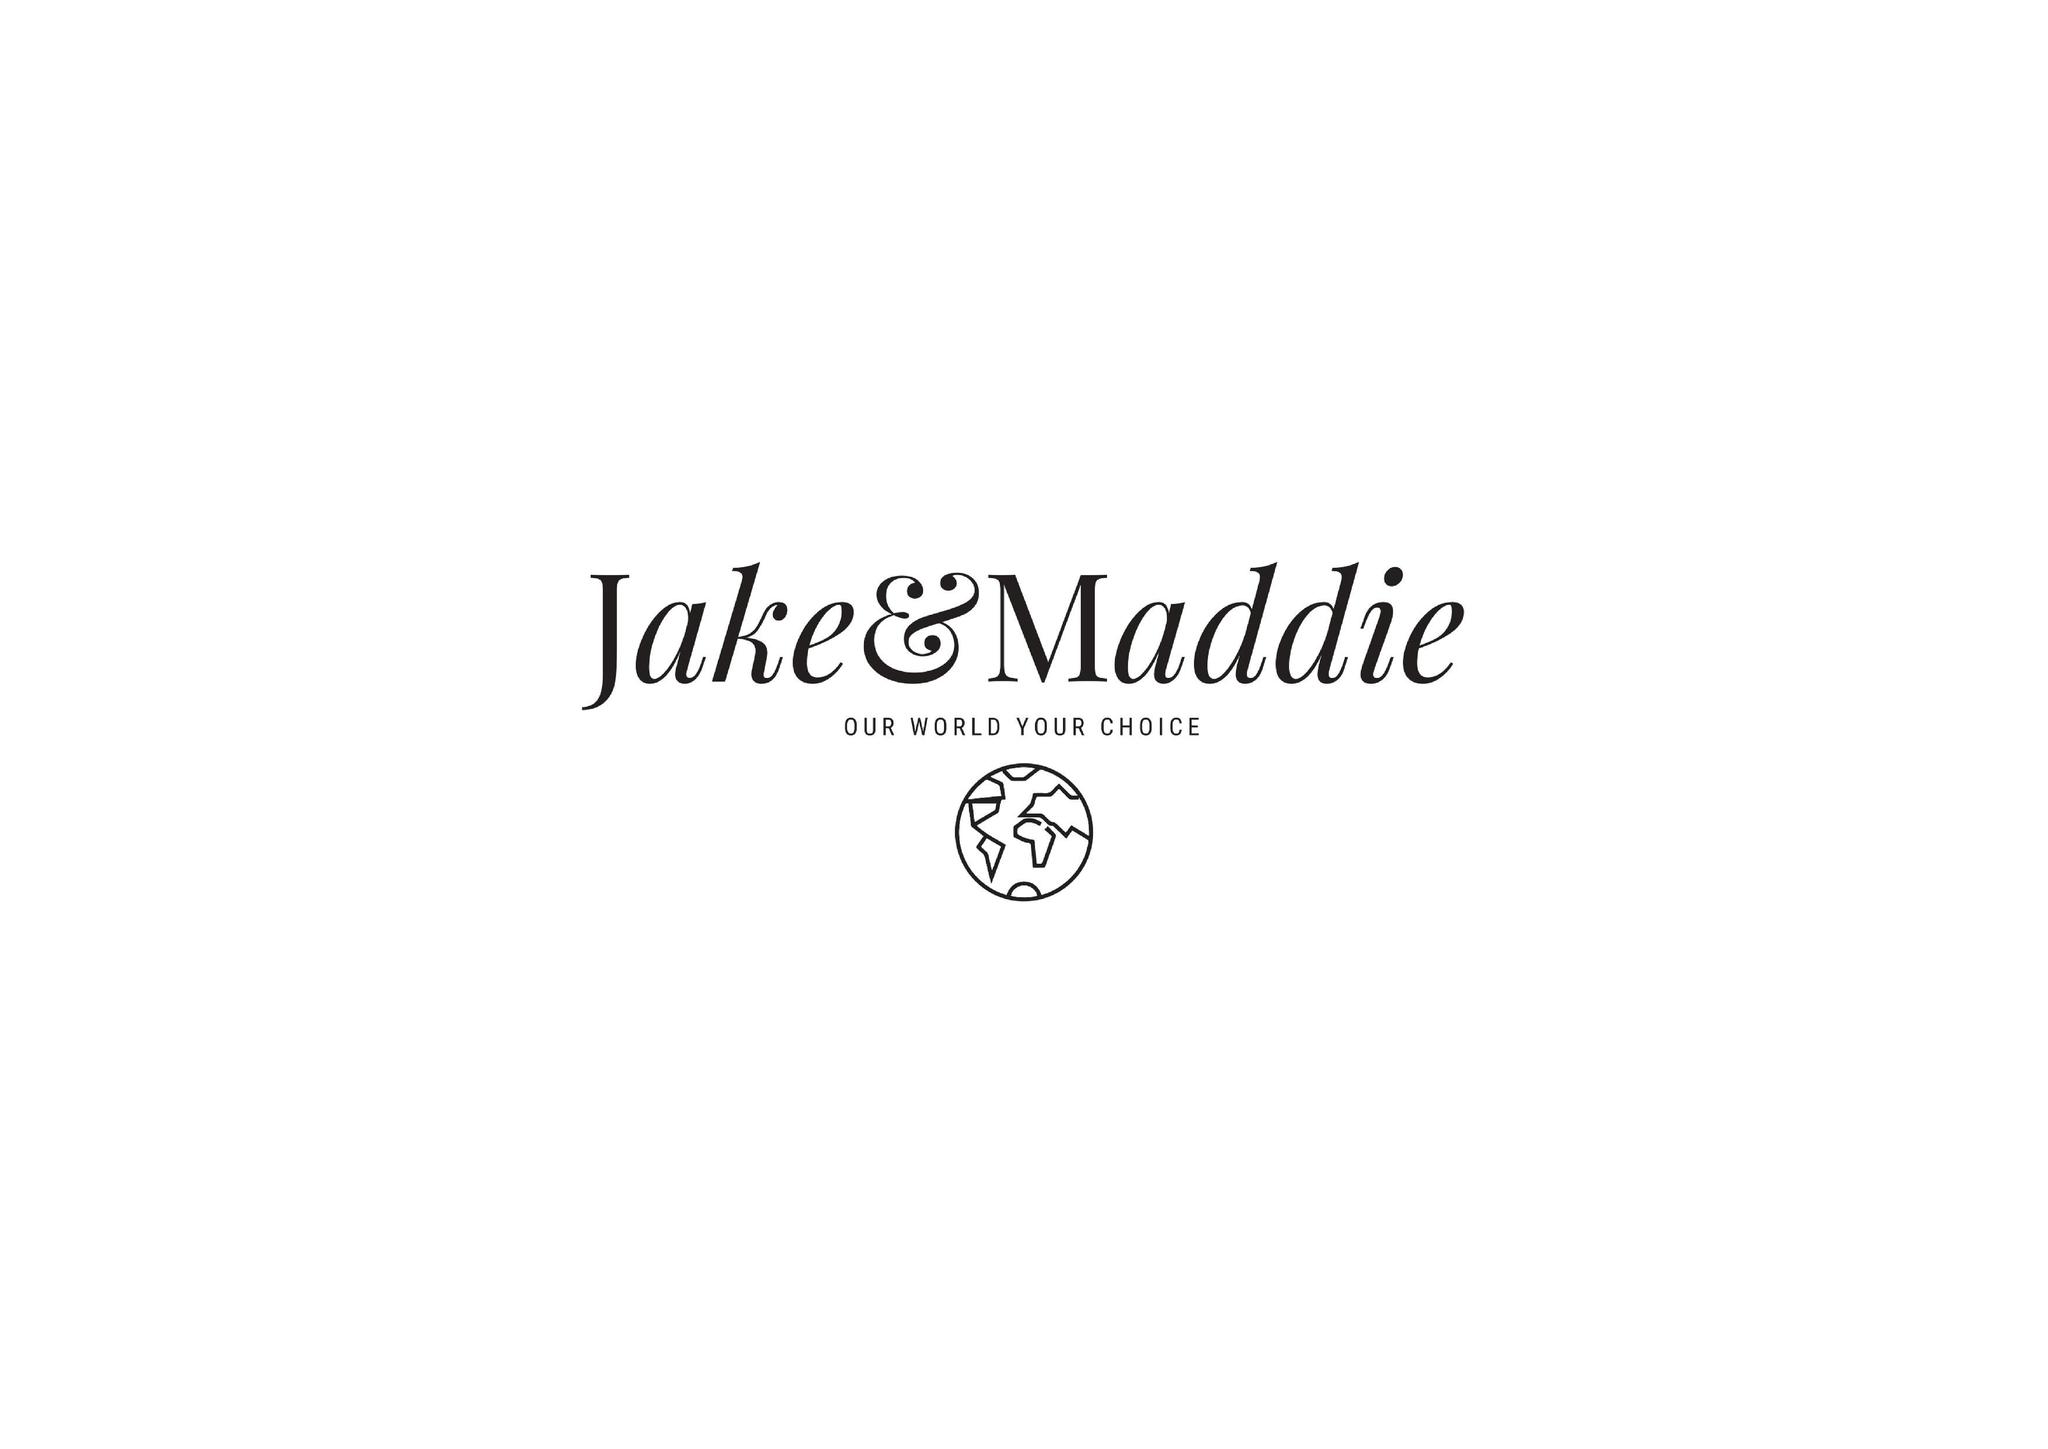 Jake & Maddie